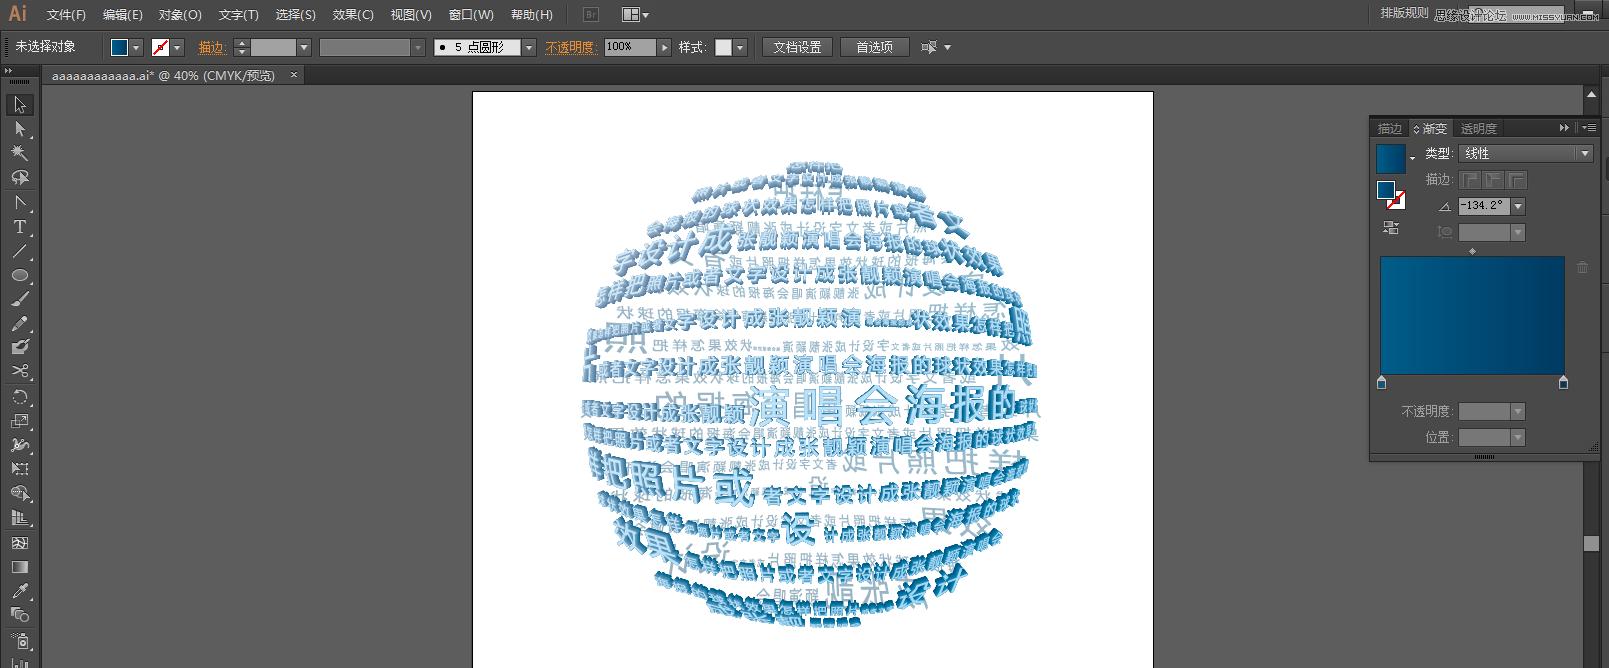 illustrator制作酷炫的张靓颖演唱会海报,ps教程,思缘教程网